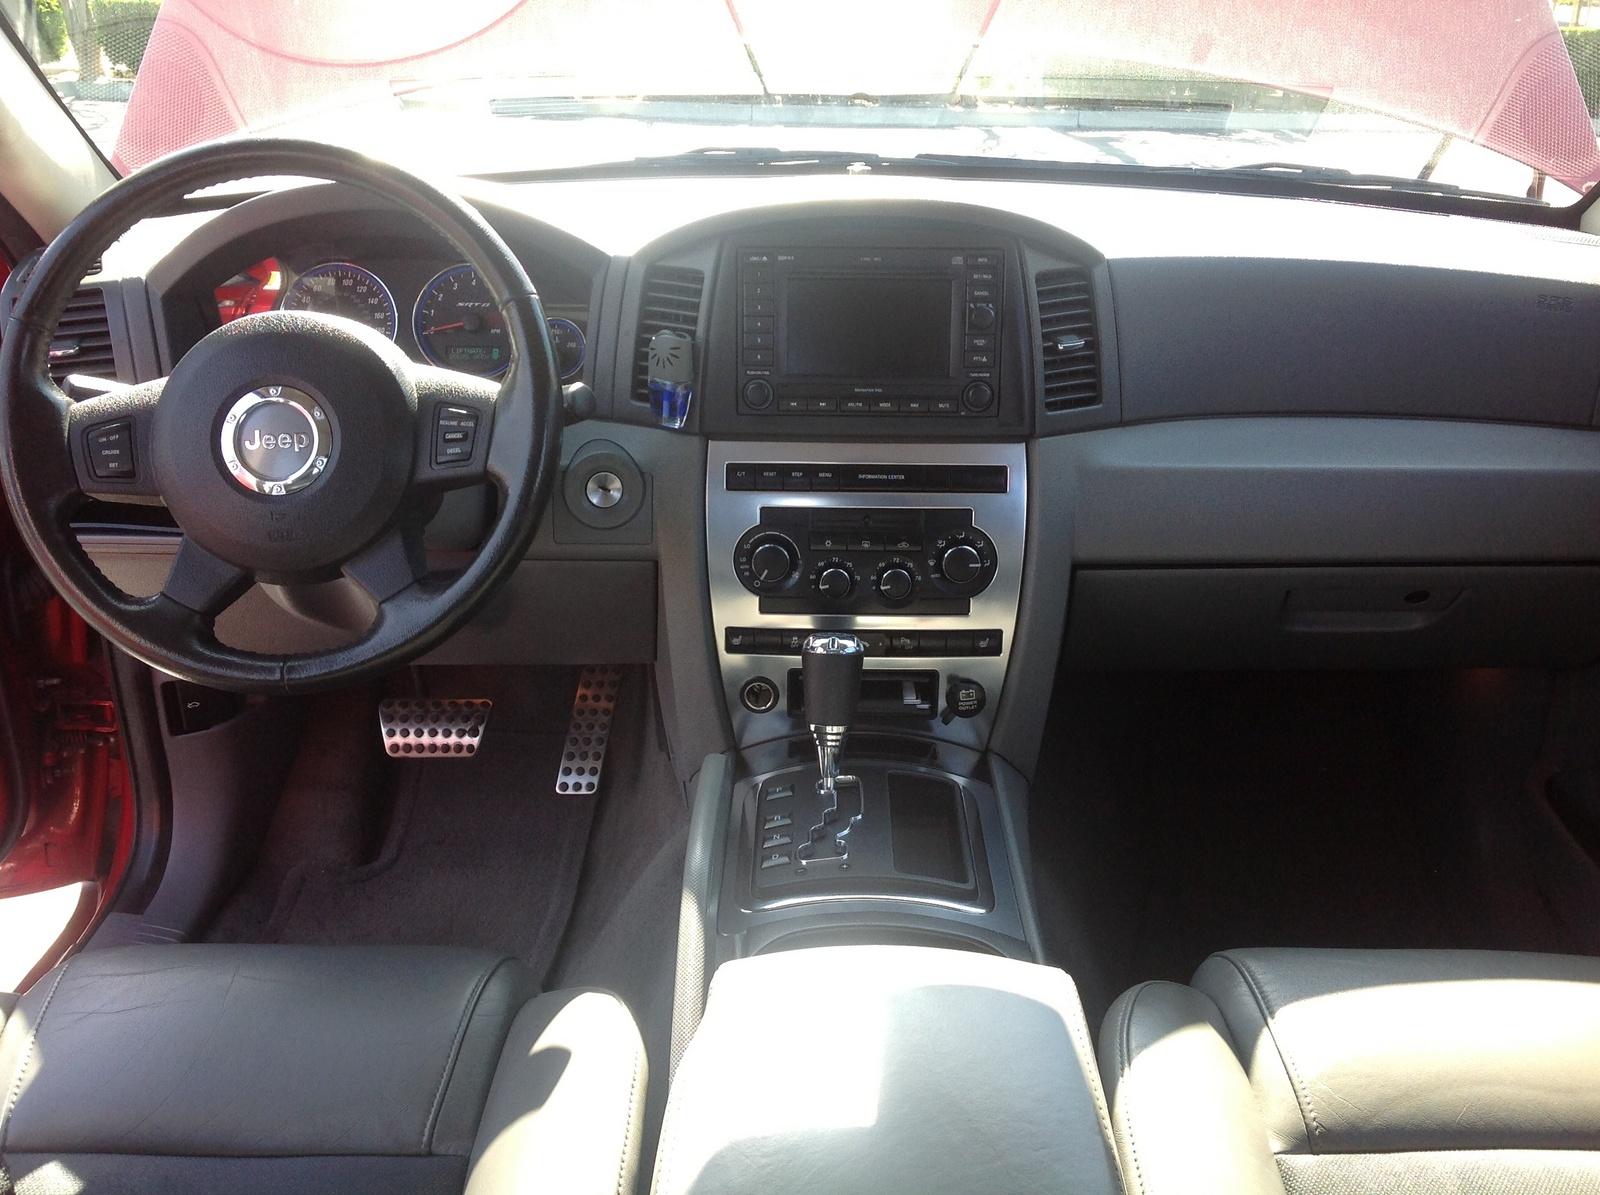 2006 Jeep Grand Cherokee Interior CarGurus